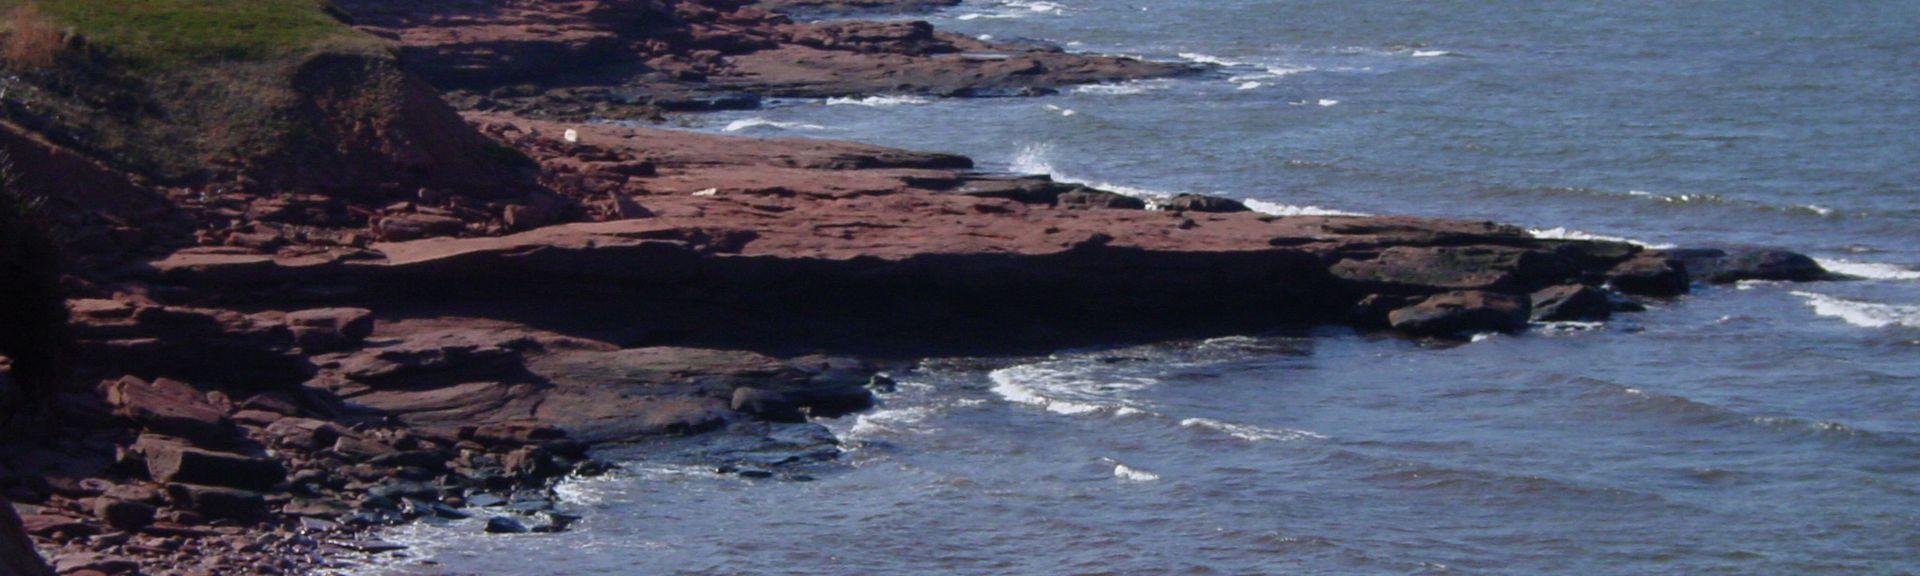 Rollo Bay Greens, Rollo Bay, Prince Edward Island, Canada